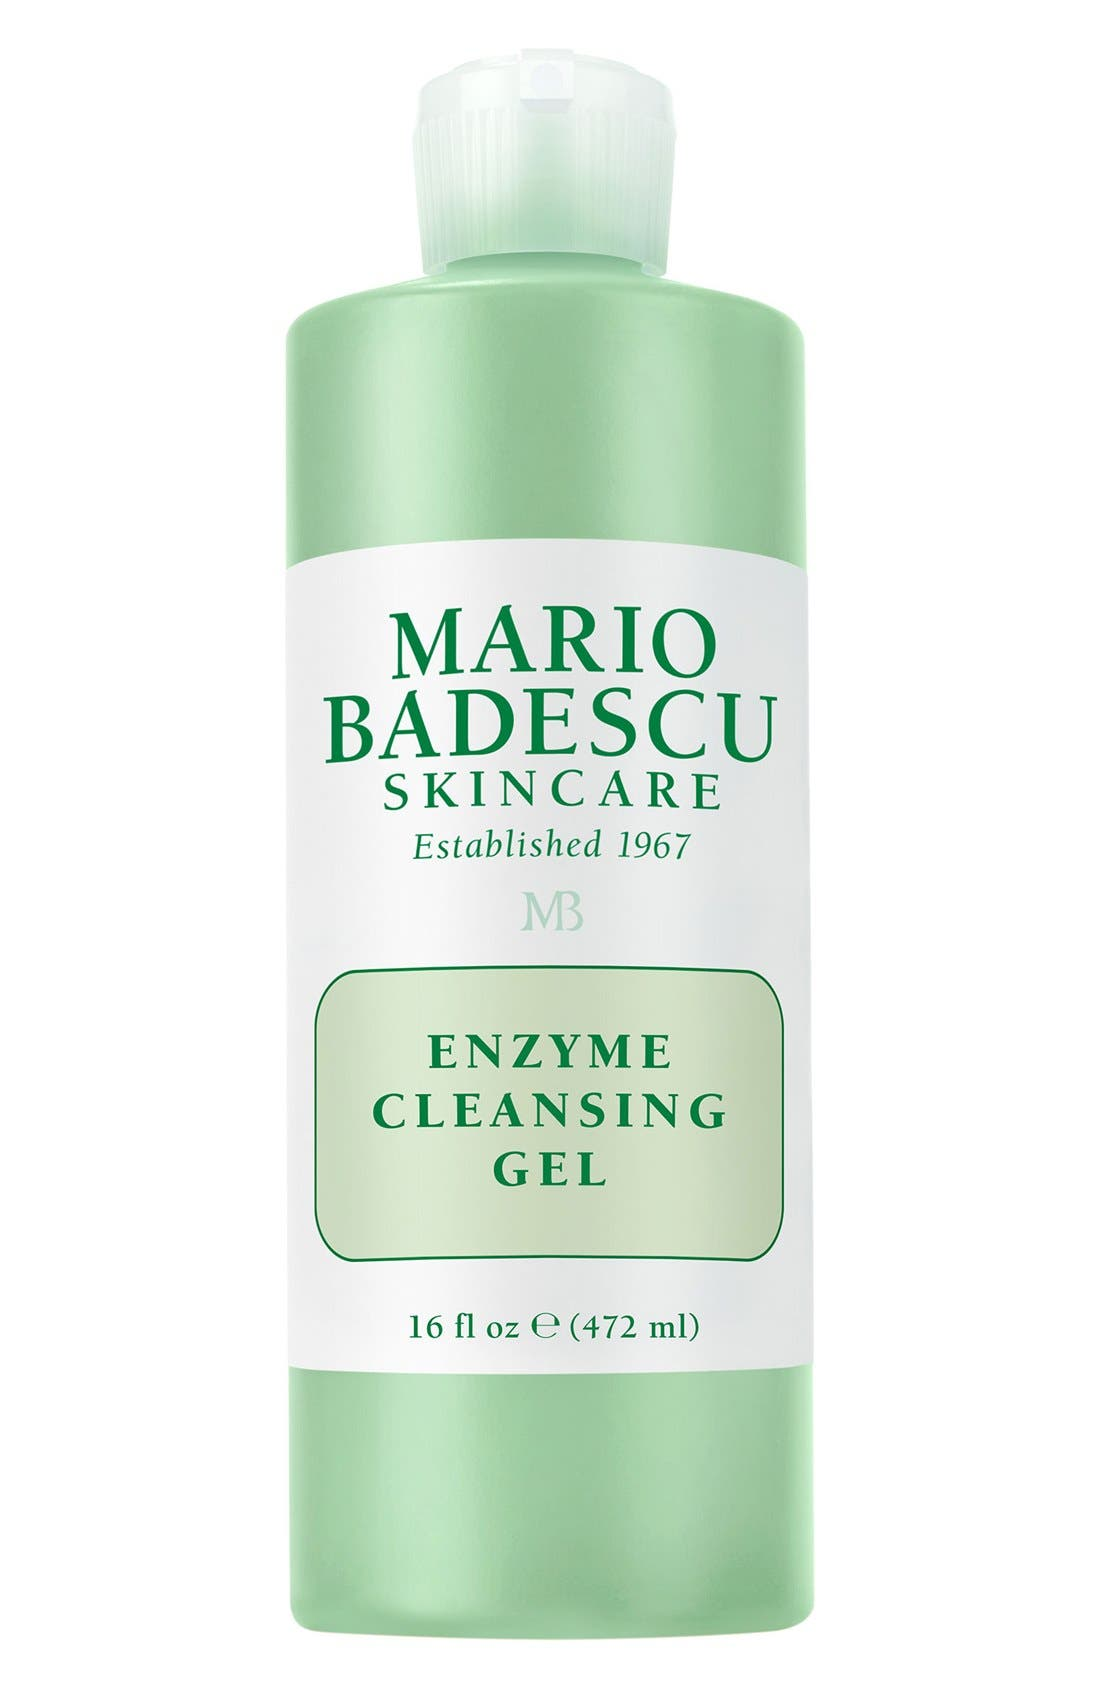 Mario Badescu Enzyme Cleansing Gel (16 oz.)